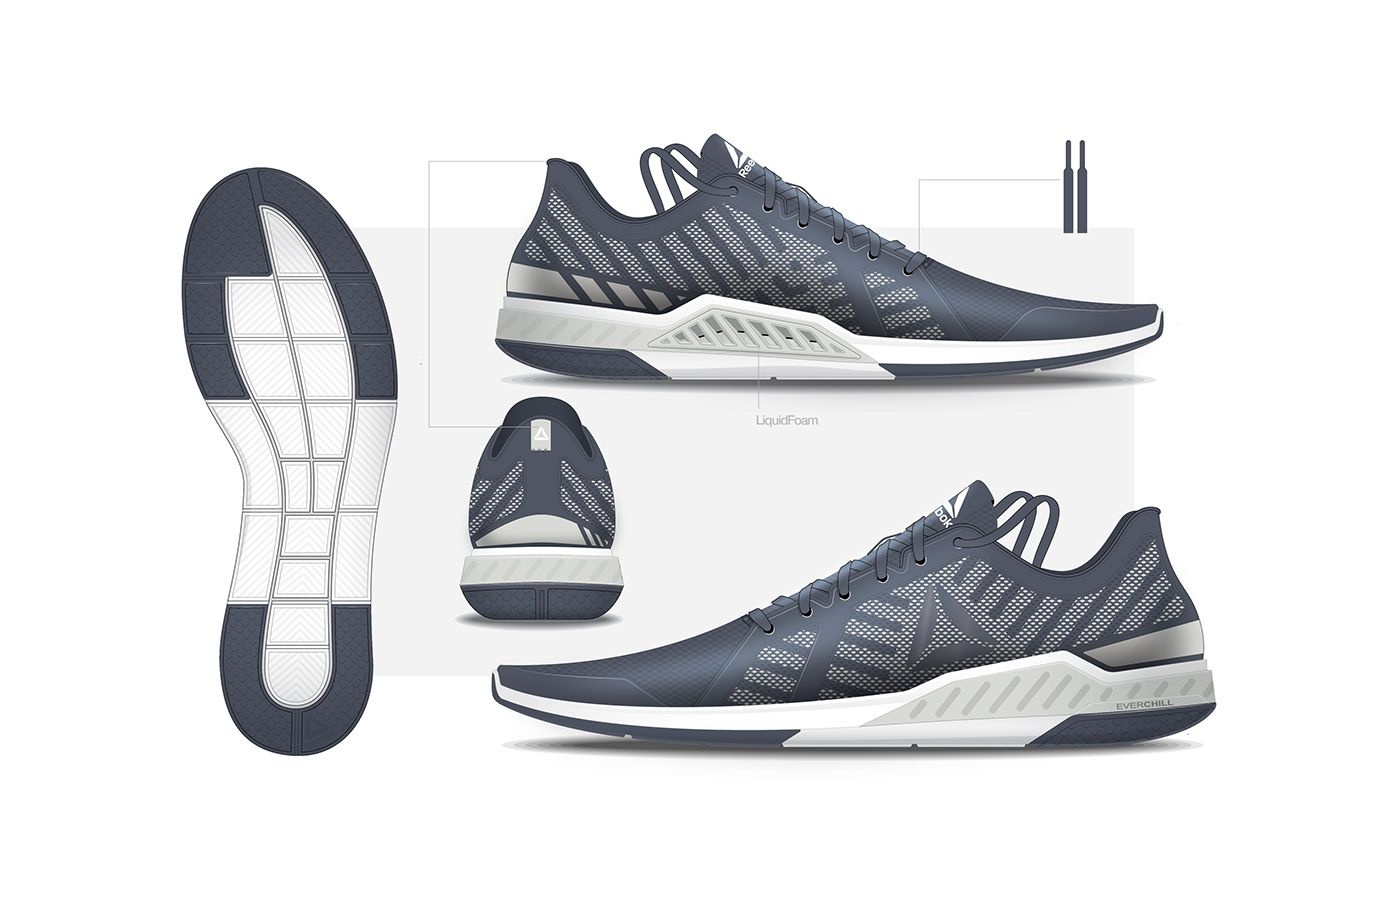 REEBOK EVERCHILL on Behance   Sepatu